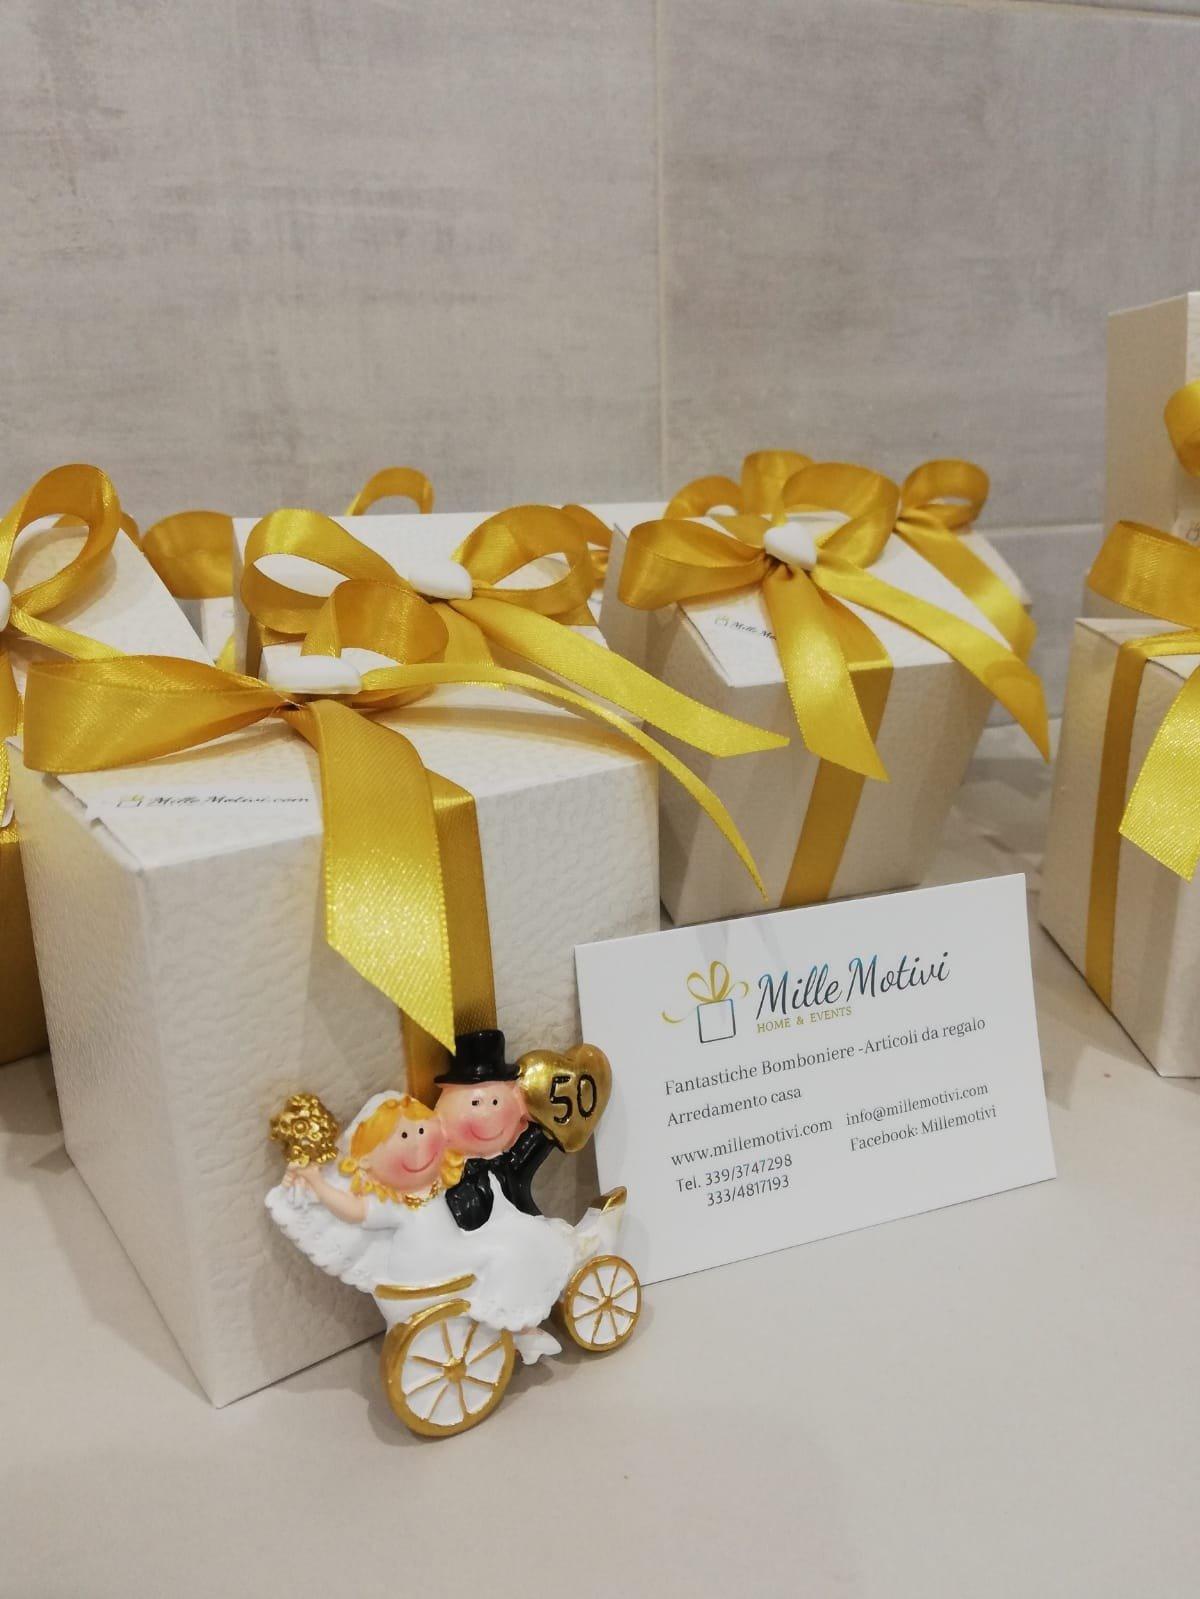 Bomboniere 50 Matrimonio.Bomboniera Anniversario 50 Anni Di Matrimonio In Resina Millemotivi